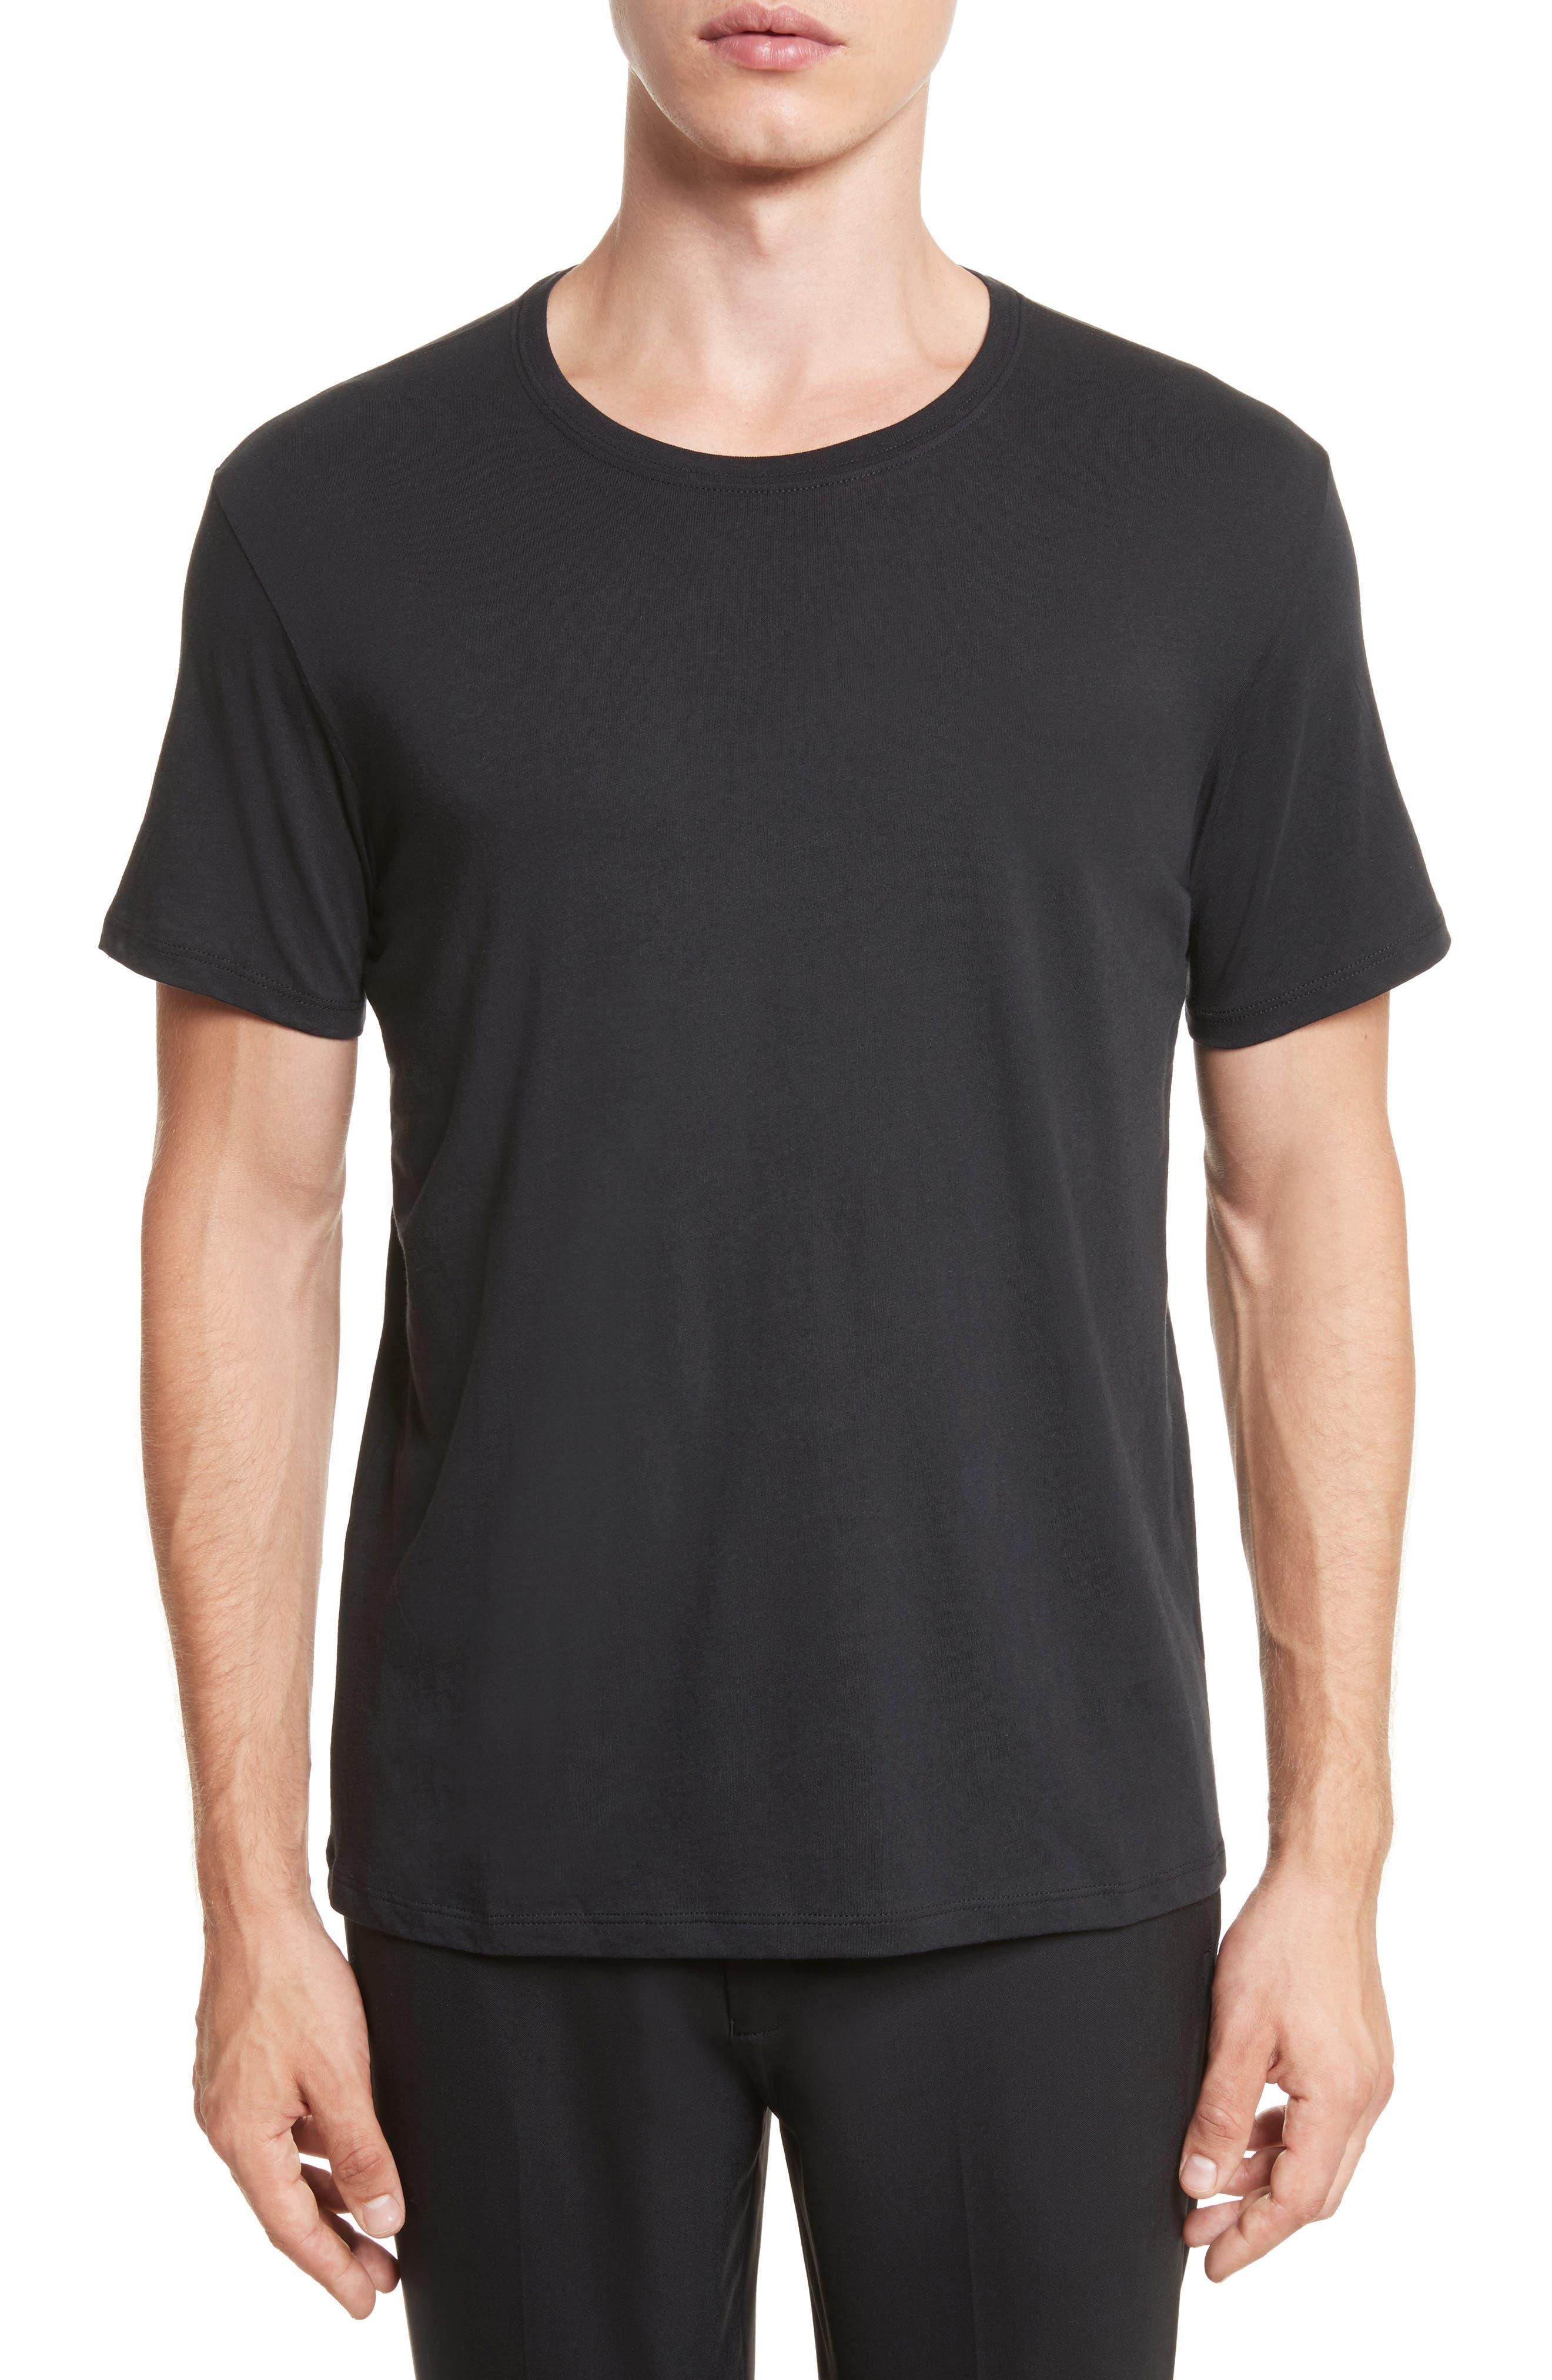 Main Image - ATM Anthony Thomas Melillo Cotton Jersey T-Shirt